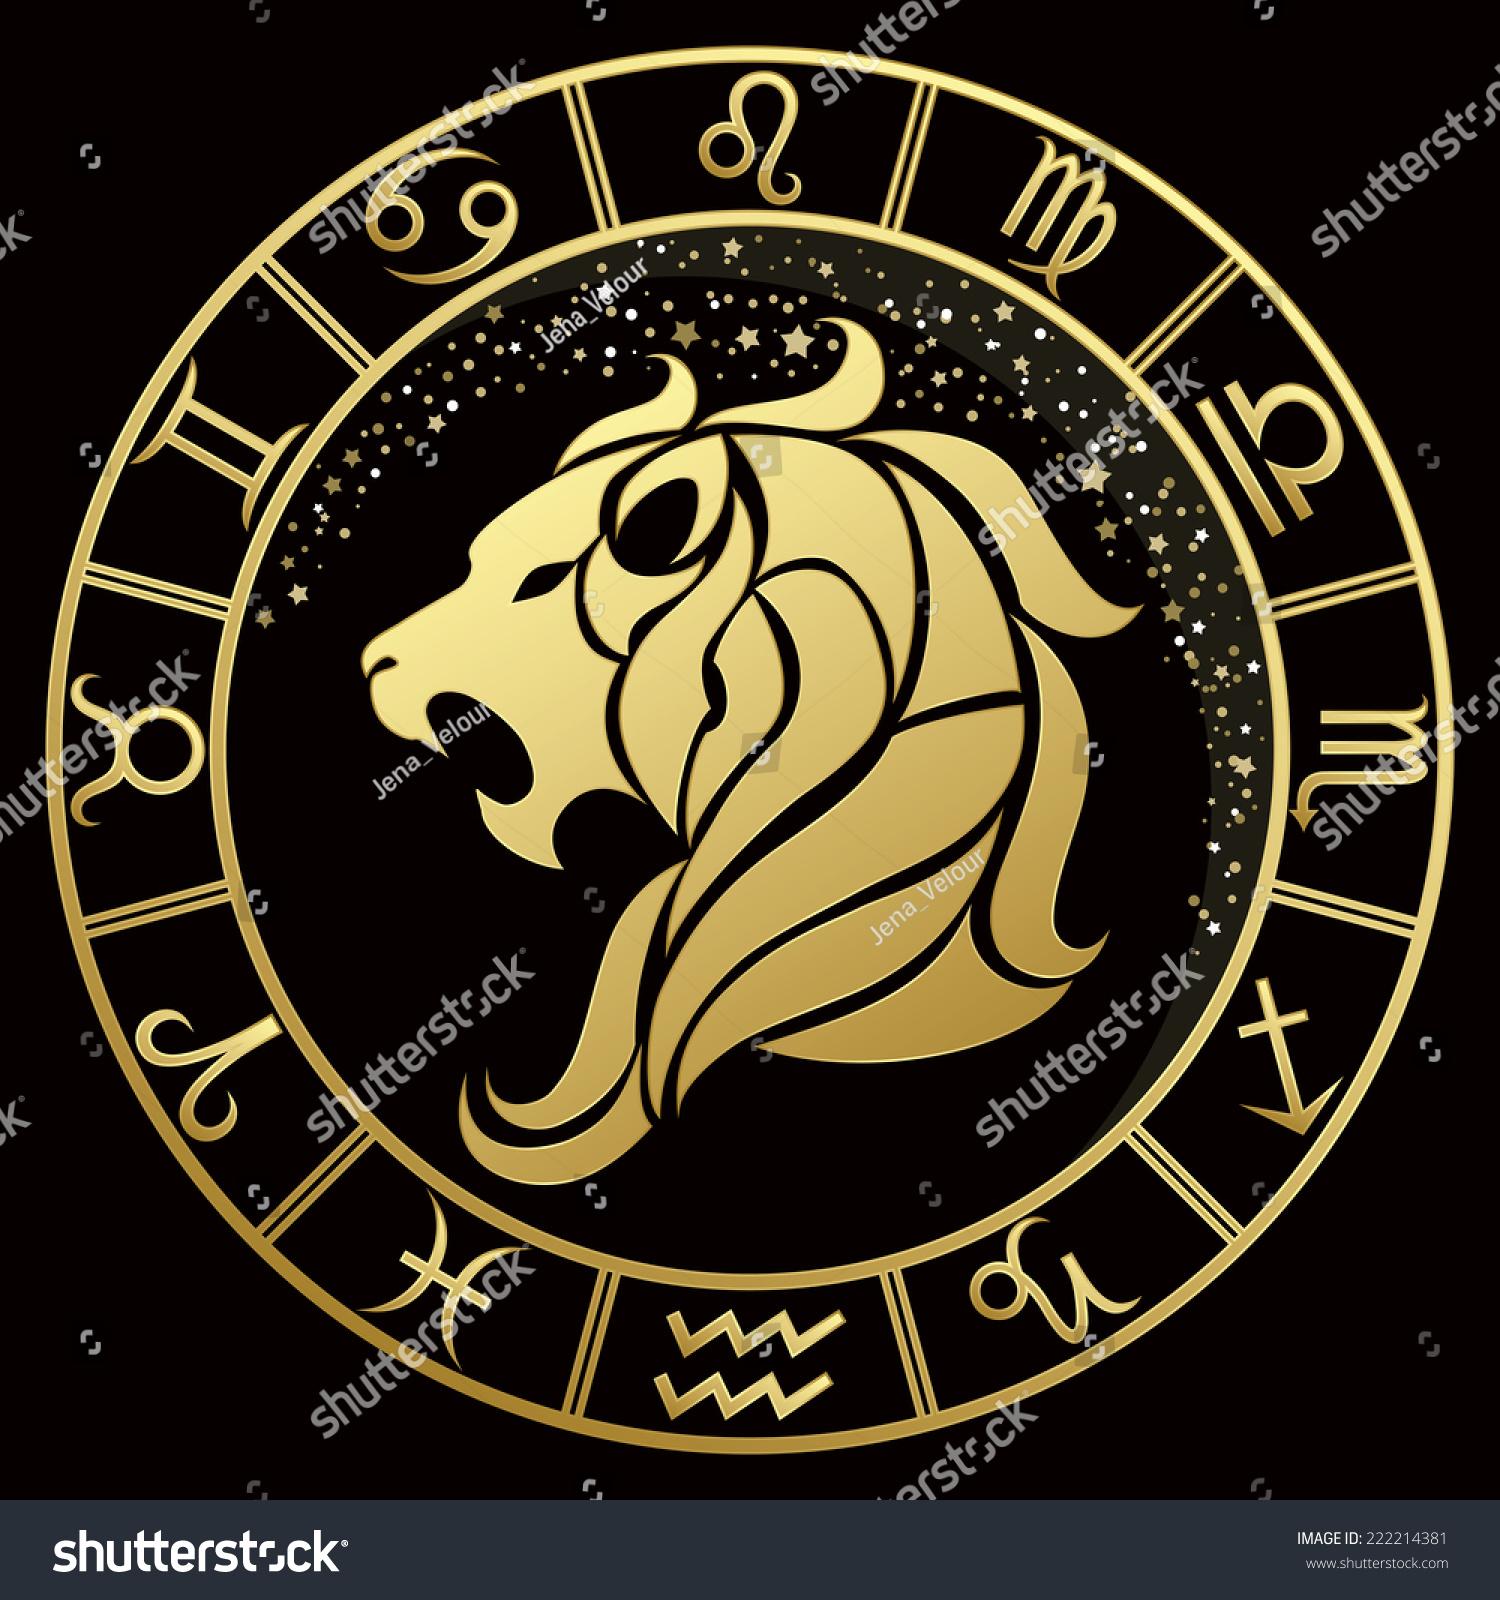 Golden Leo Zodiac Sign Vector Illustration Stock Vector Royalty